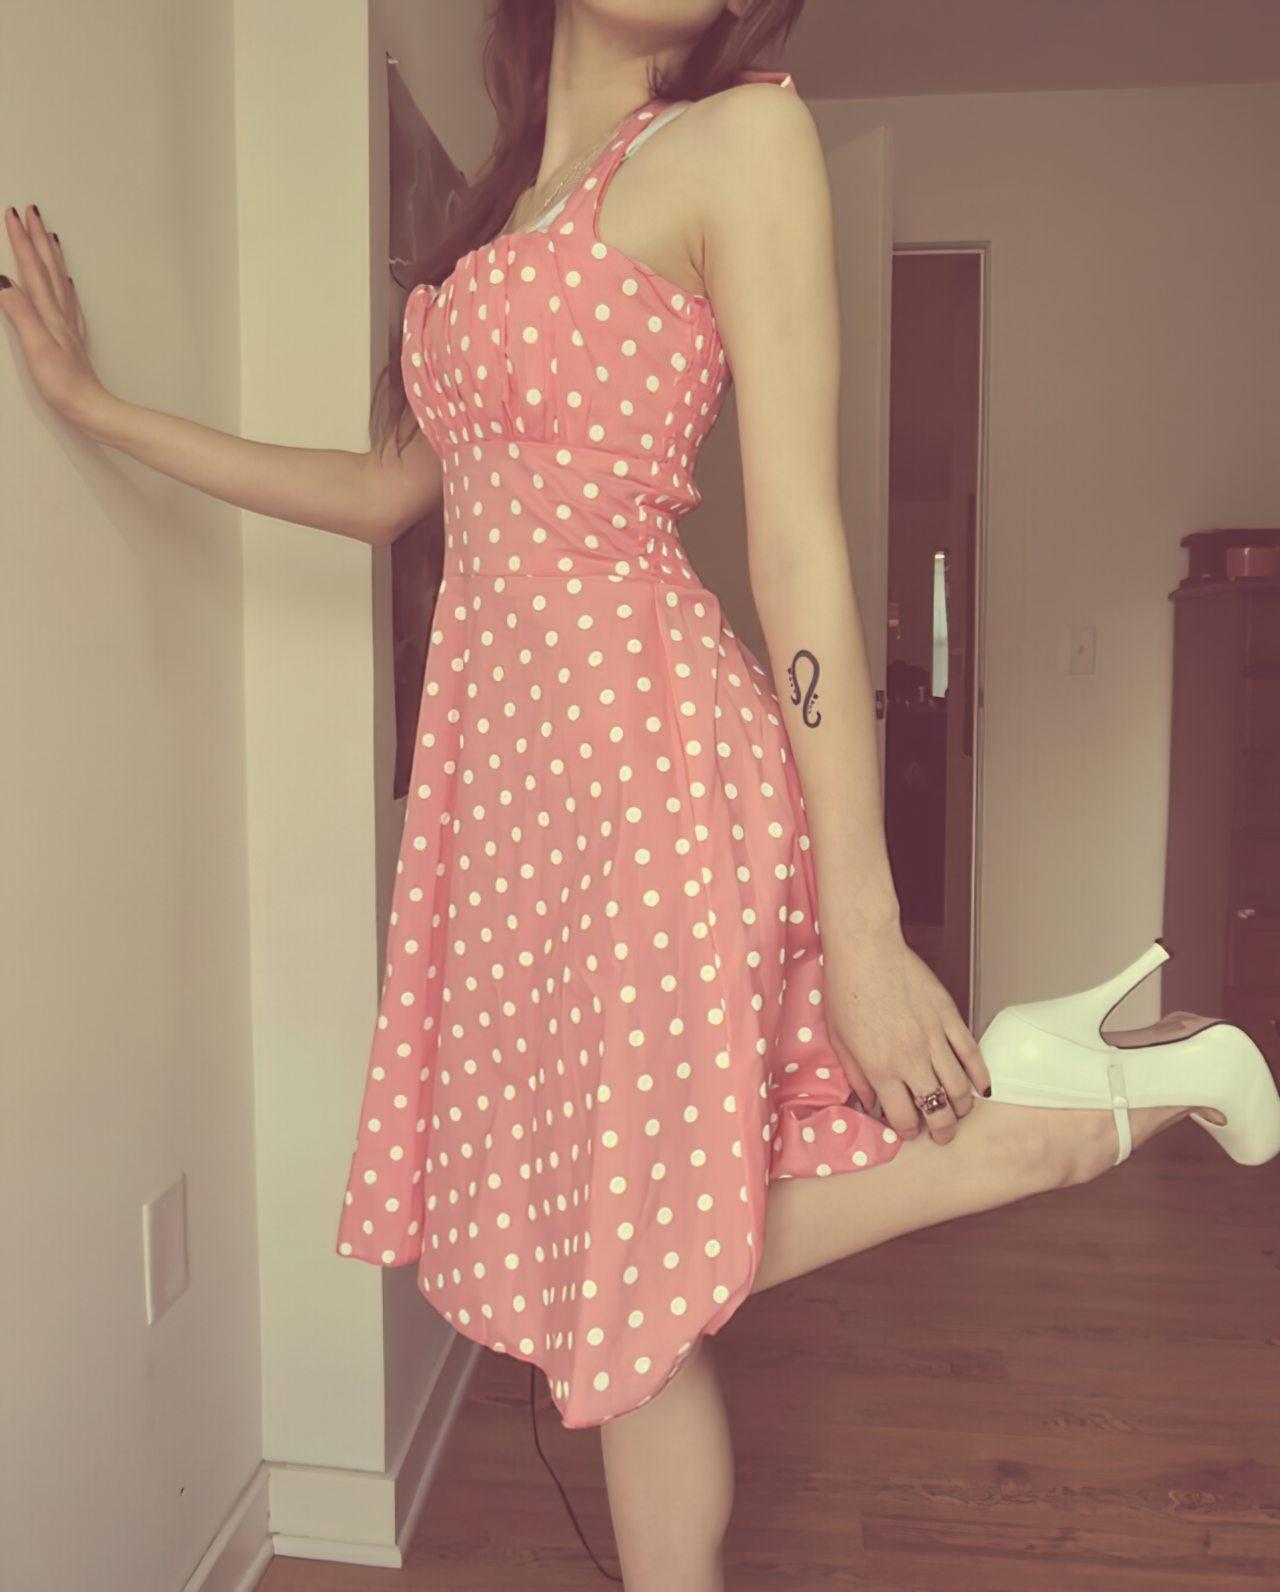 Gatinha Despindo o Vestido (1)